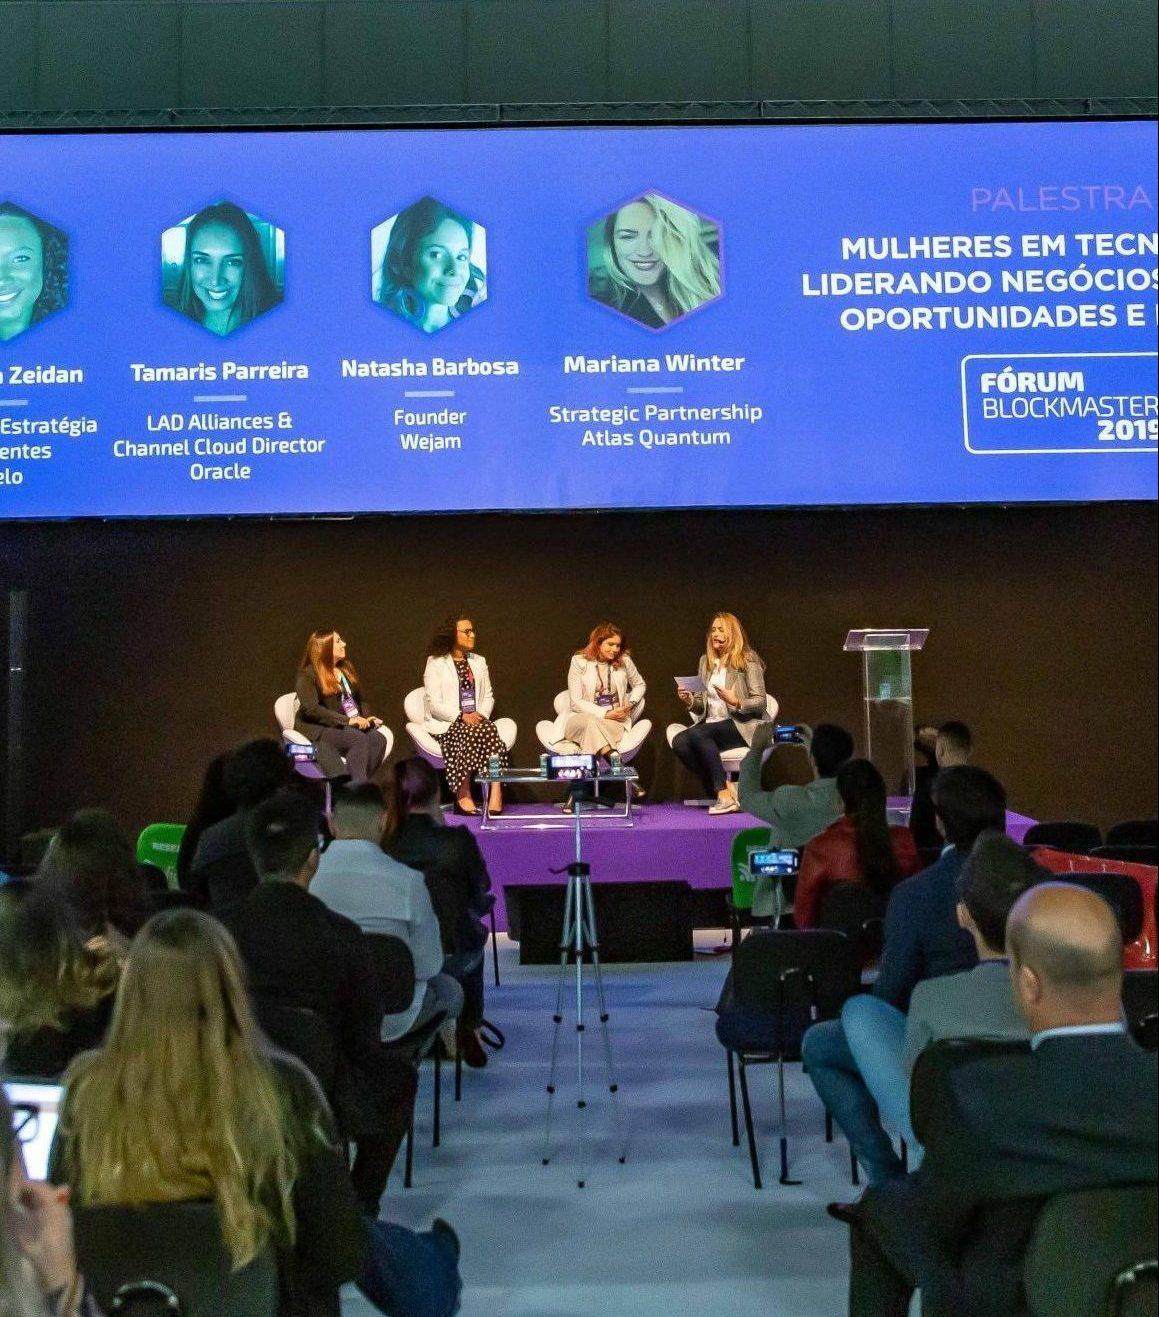 Palestrante - Daniela Zeidan - Tamaris Parreira - Natasha Barbosa - Mariana Winter - BLOCKMASTER 2019 - 28 e 29-08-2019 - IMG3957